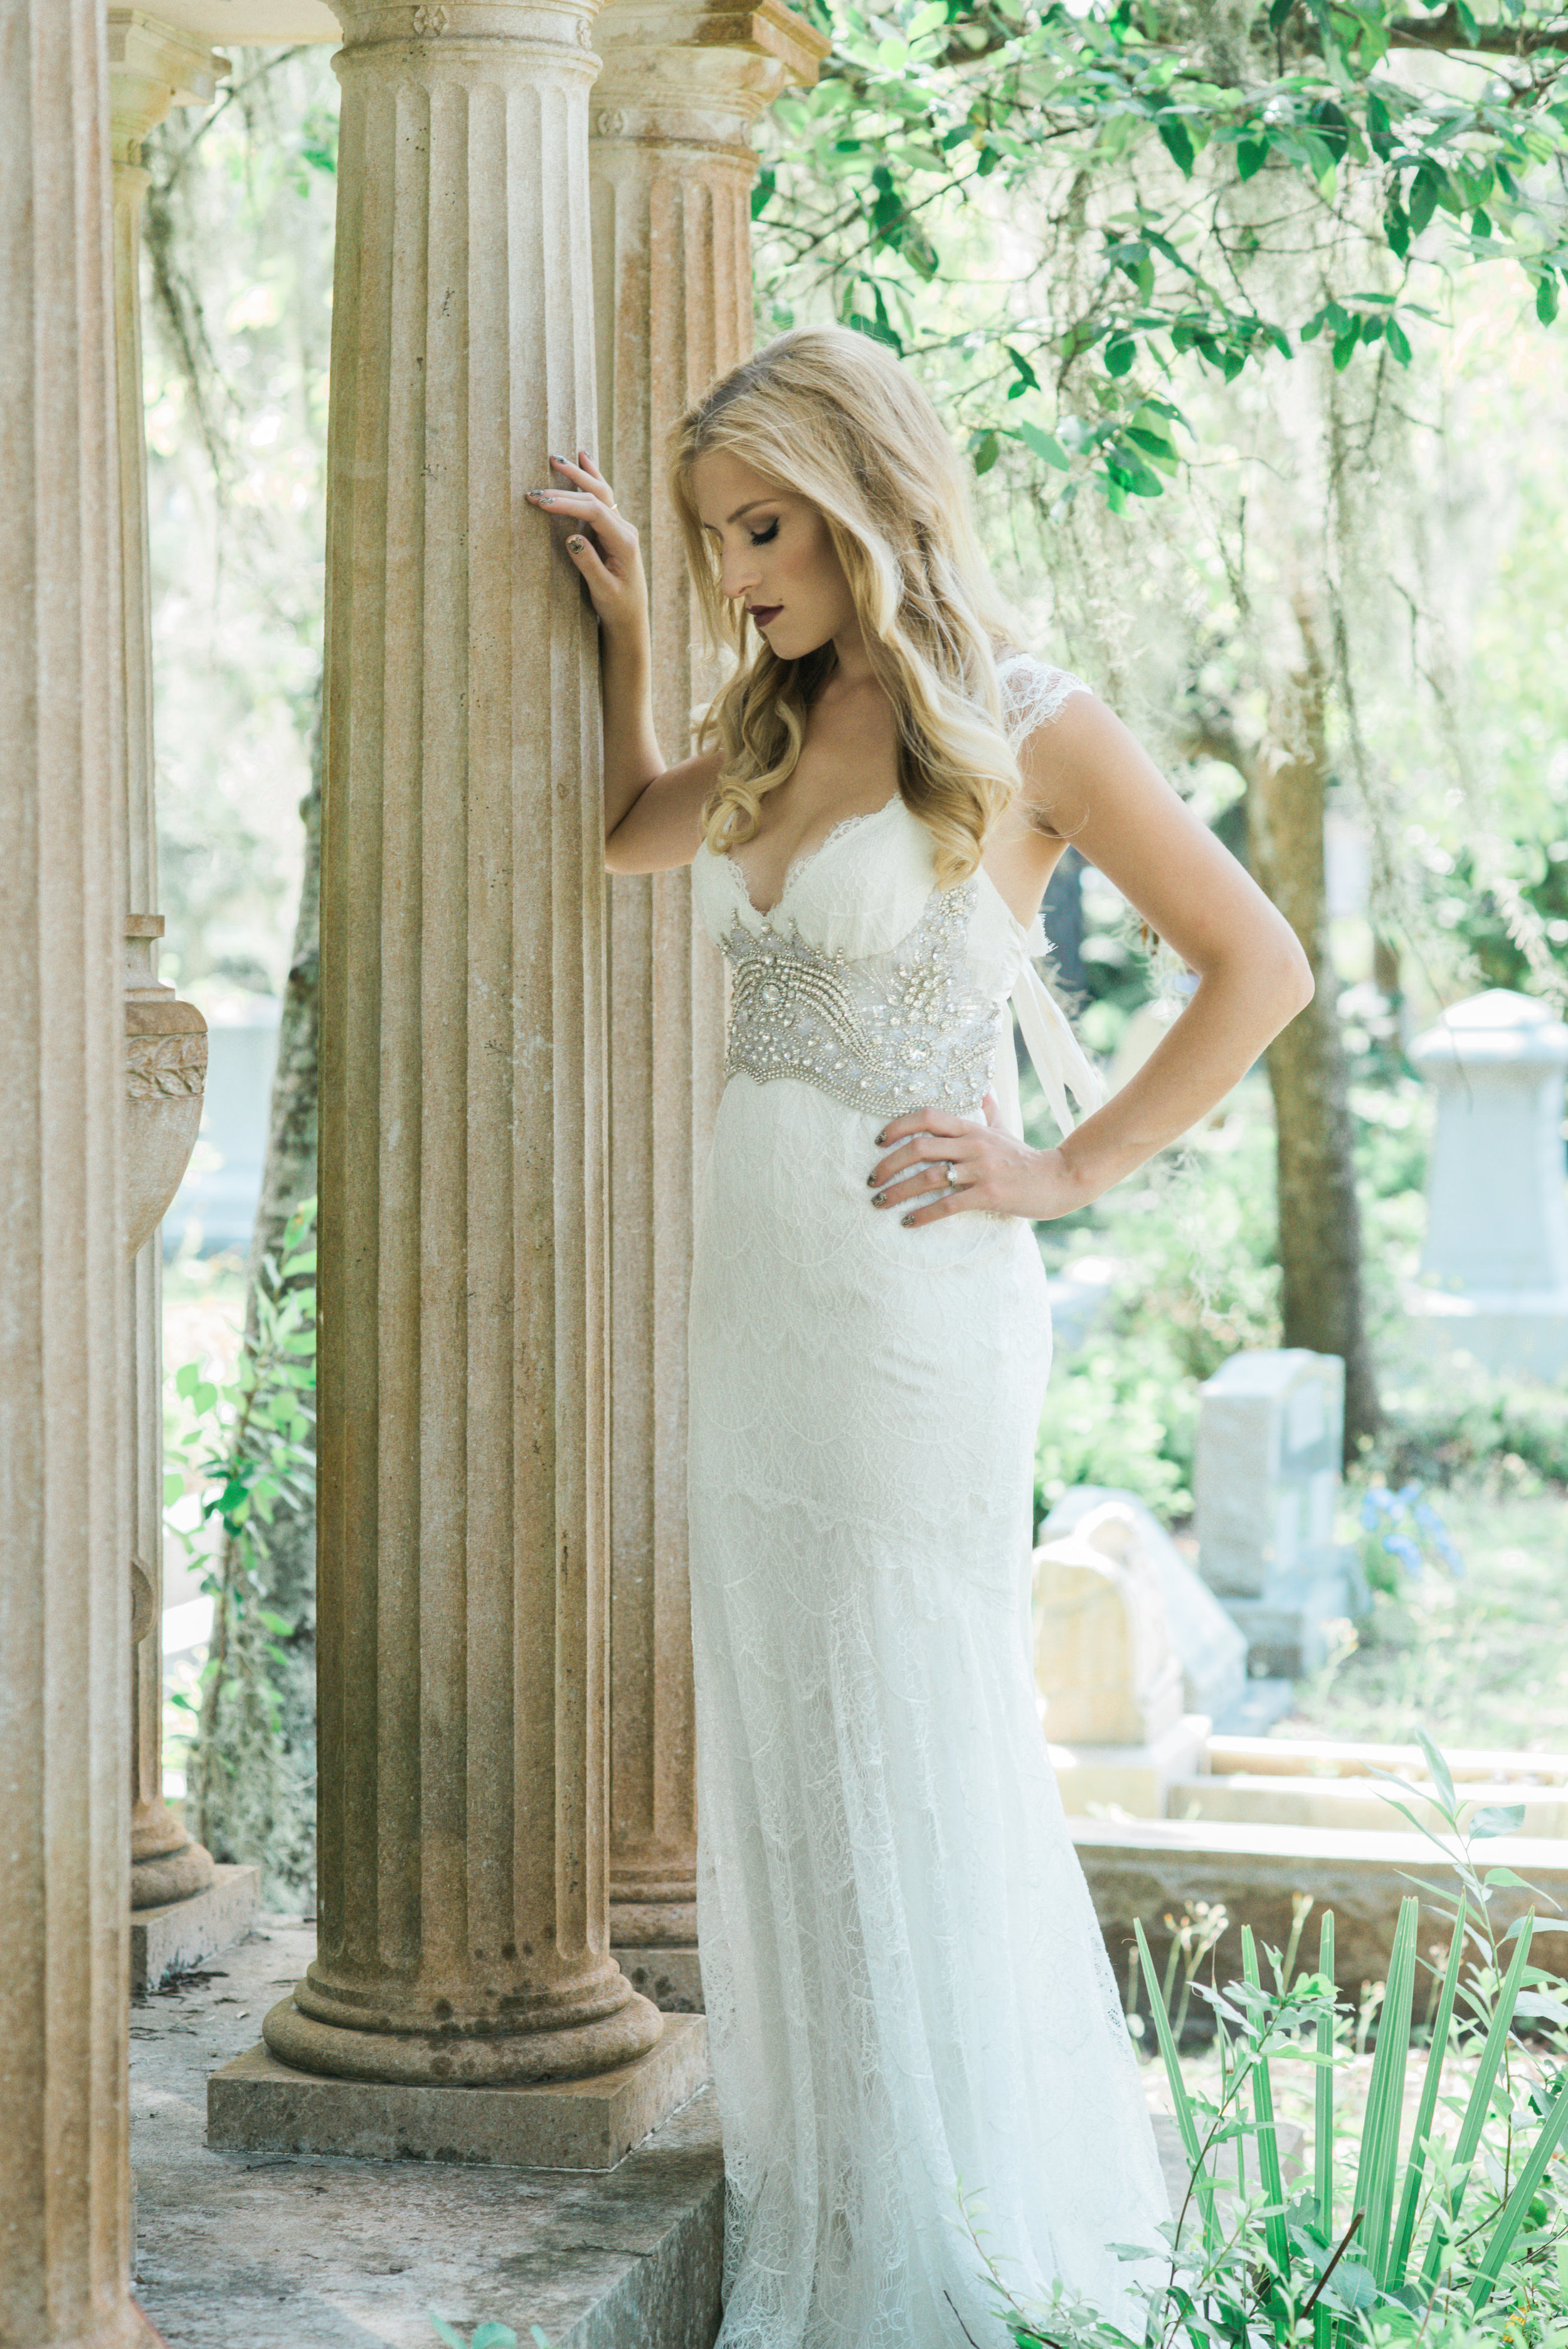 callie-beale-photography-Bonaventure-cemetery-michelle-royal-makeup-cemetery-wedding-ivory-and-beau-wedding-planning-anna-campbell-harper-savannah-bridal-boutique-savannah-wedding-dresses-savannah-weddings-1.jpg